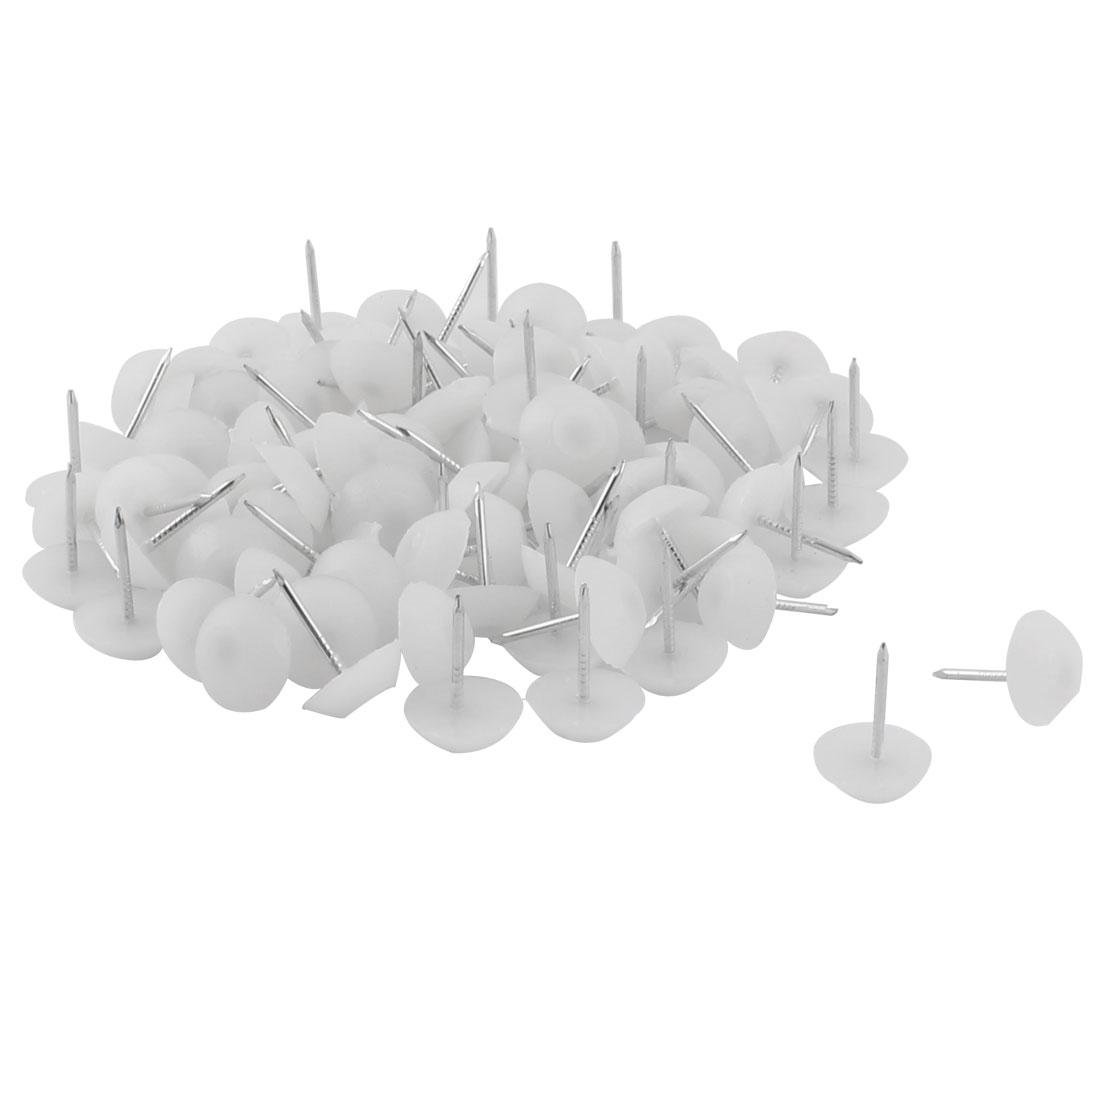 Furniture Chair Plastic Leg Feet Protector Non-slip Nails White 1.2cm Dia 100pcs